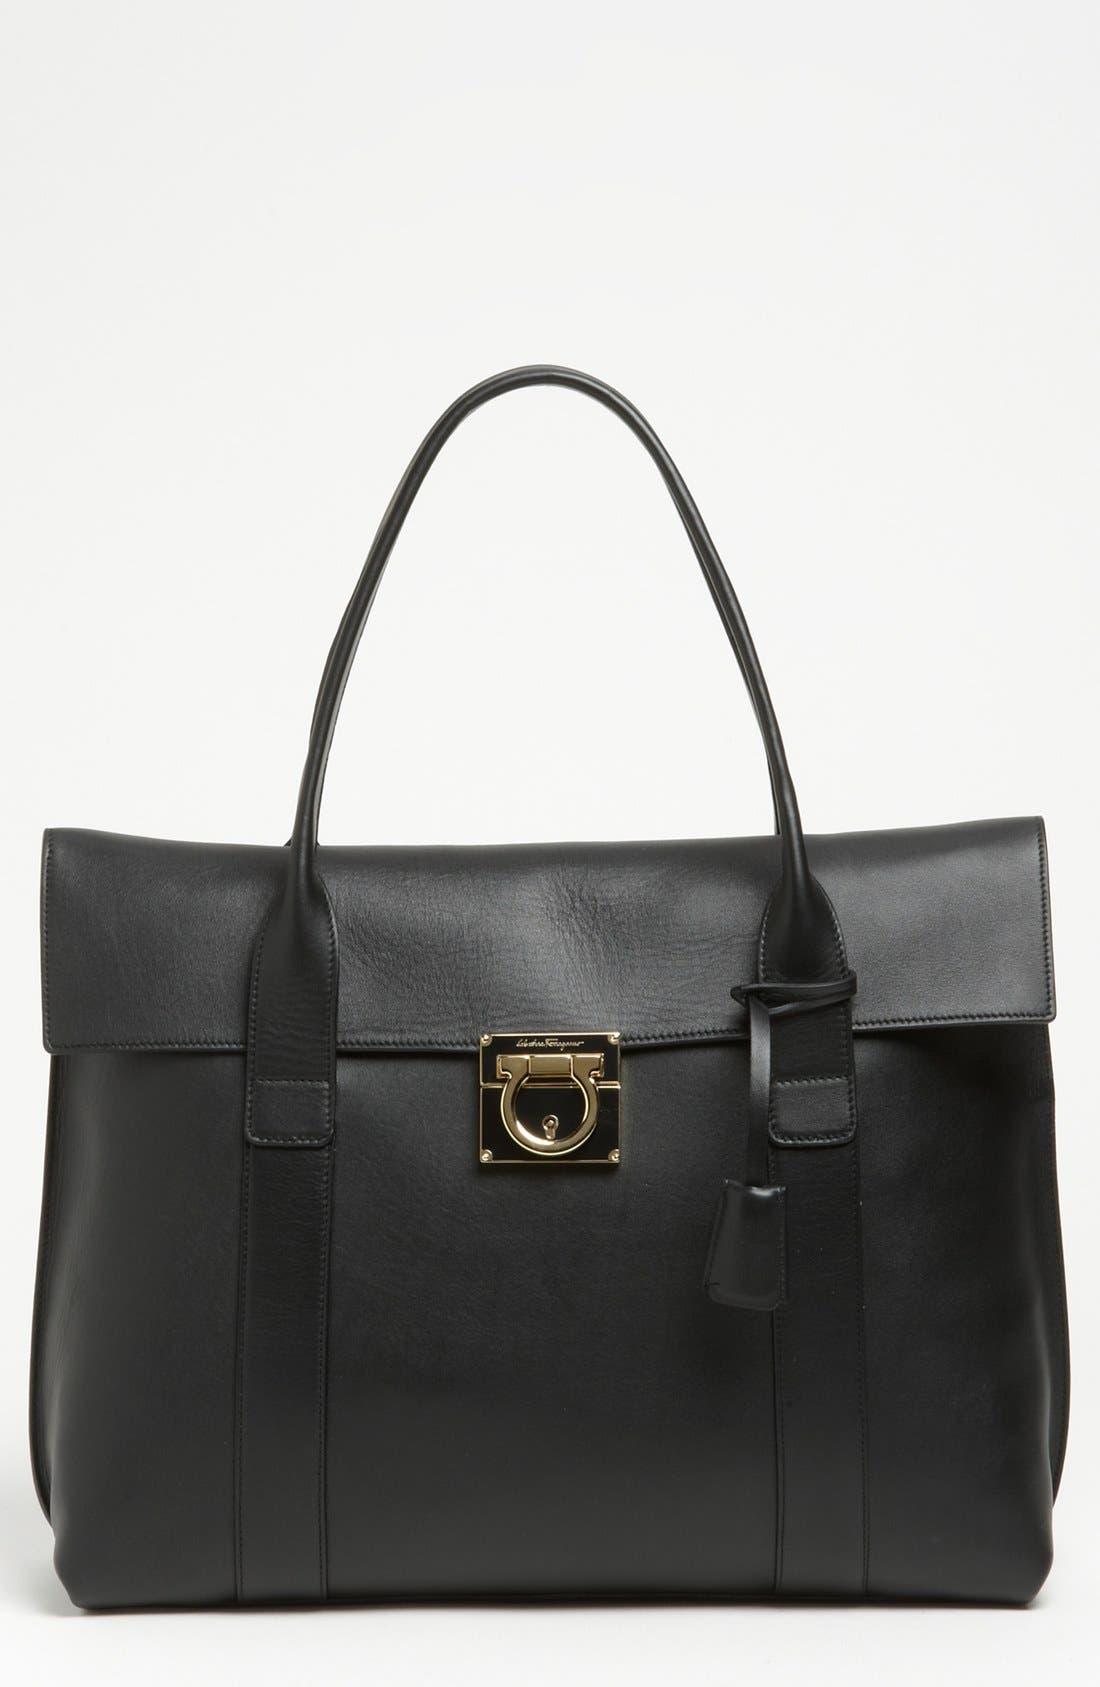 Alternate Image 1 Selected - Salvatore Ferragamo 'Large Sookie' Leather Shopper